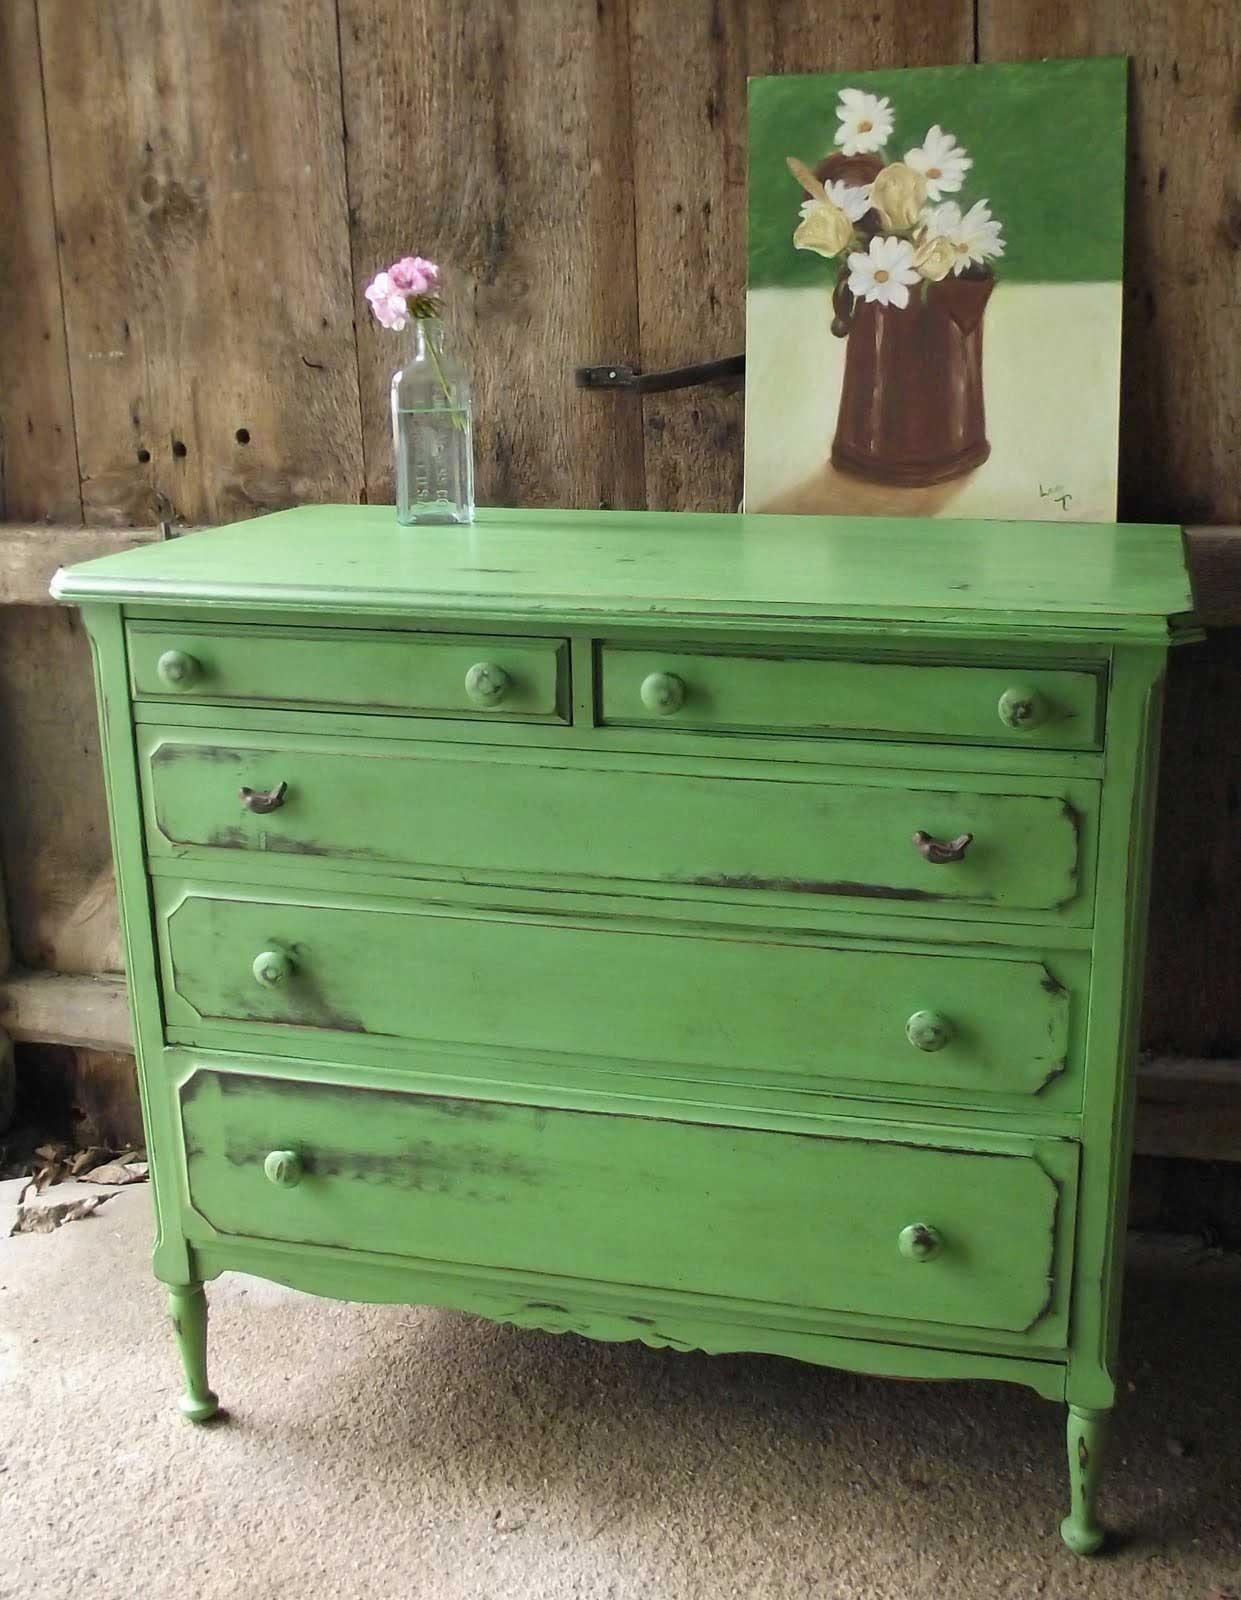 Comment Laquer Un Meuble En Bois Green Distressed Furniture Green Dresser Annie Sloan Painted Furniture